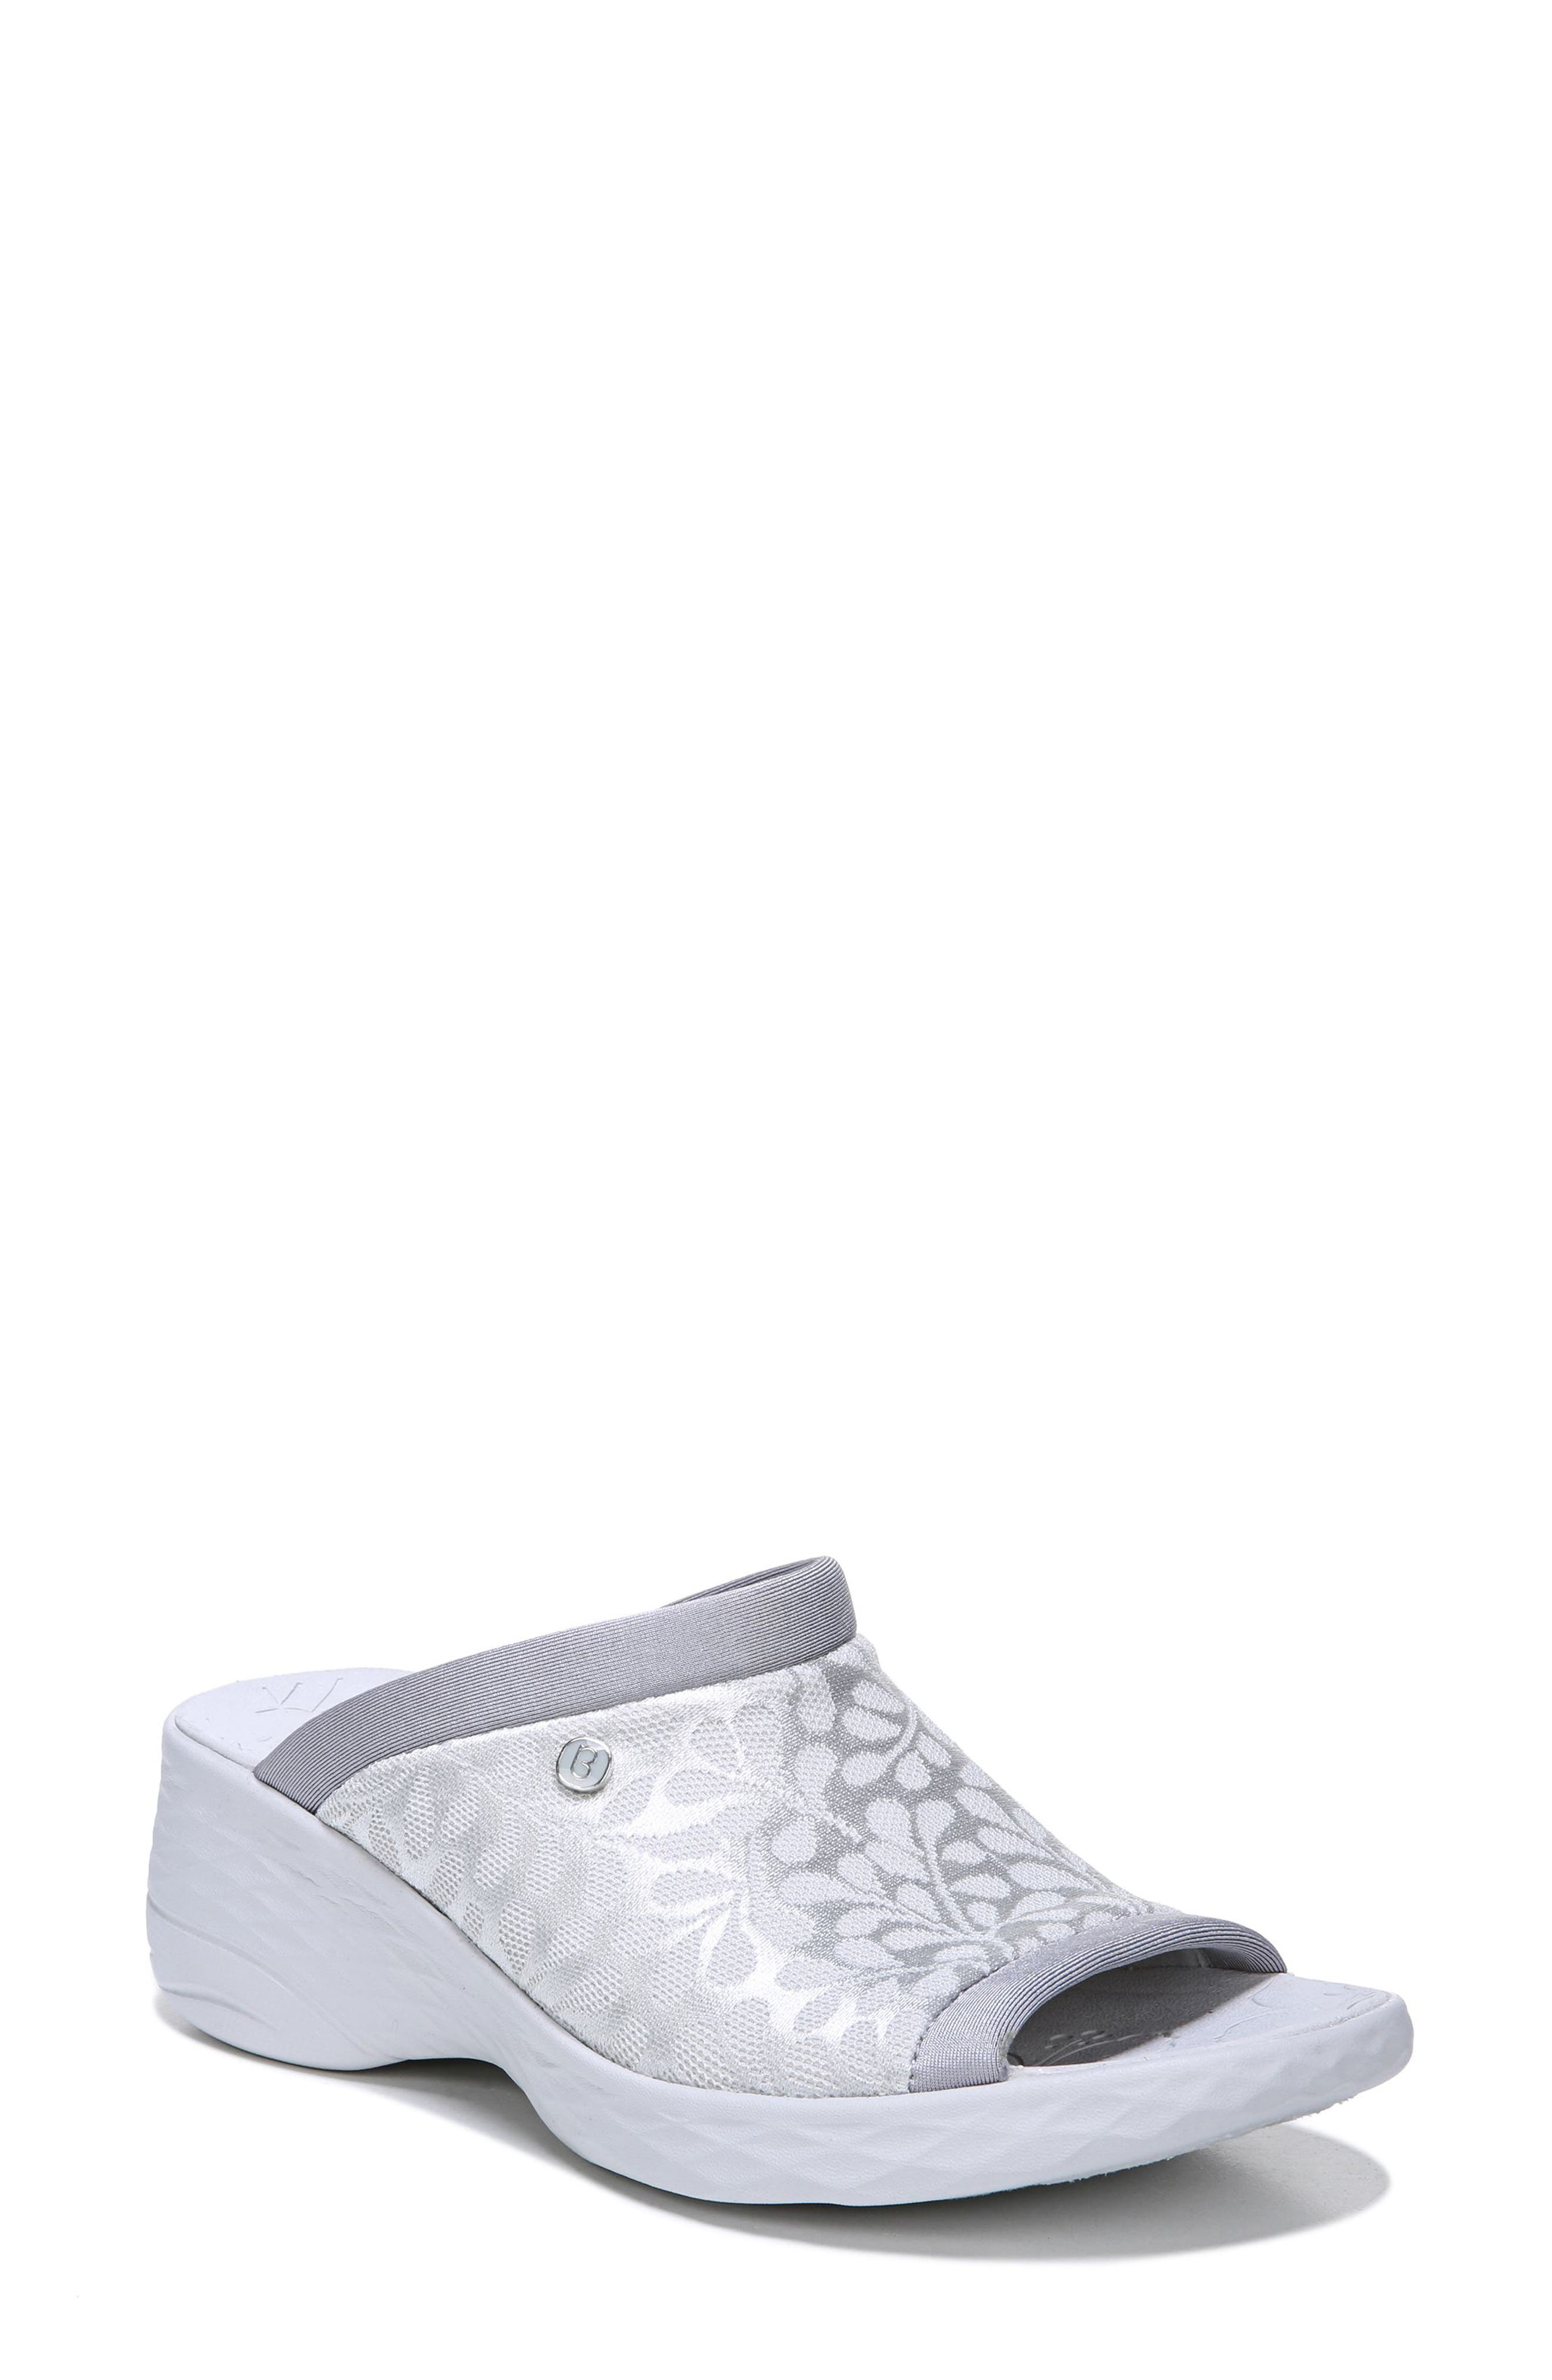 Bzees Jubilee Sandal, Grey